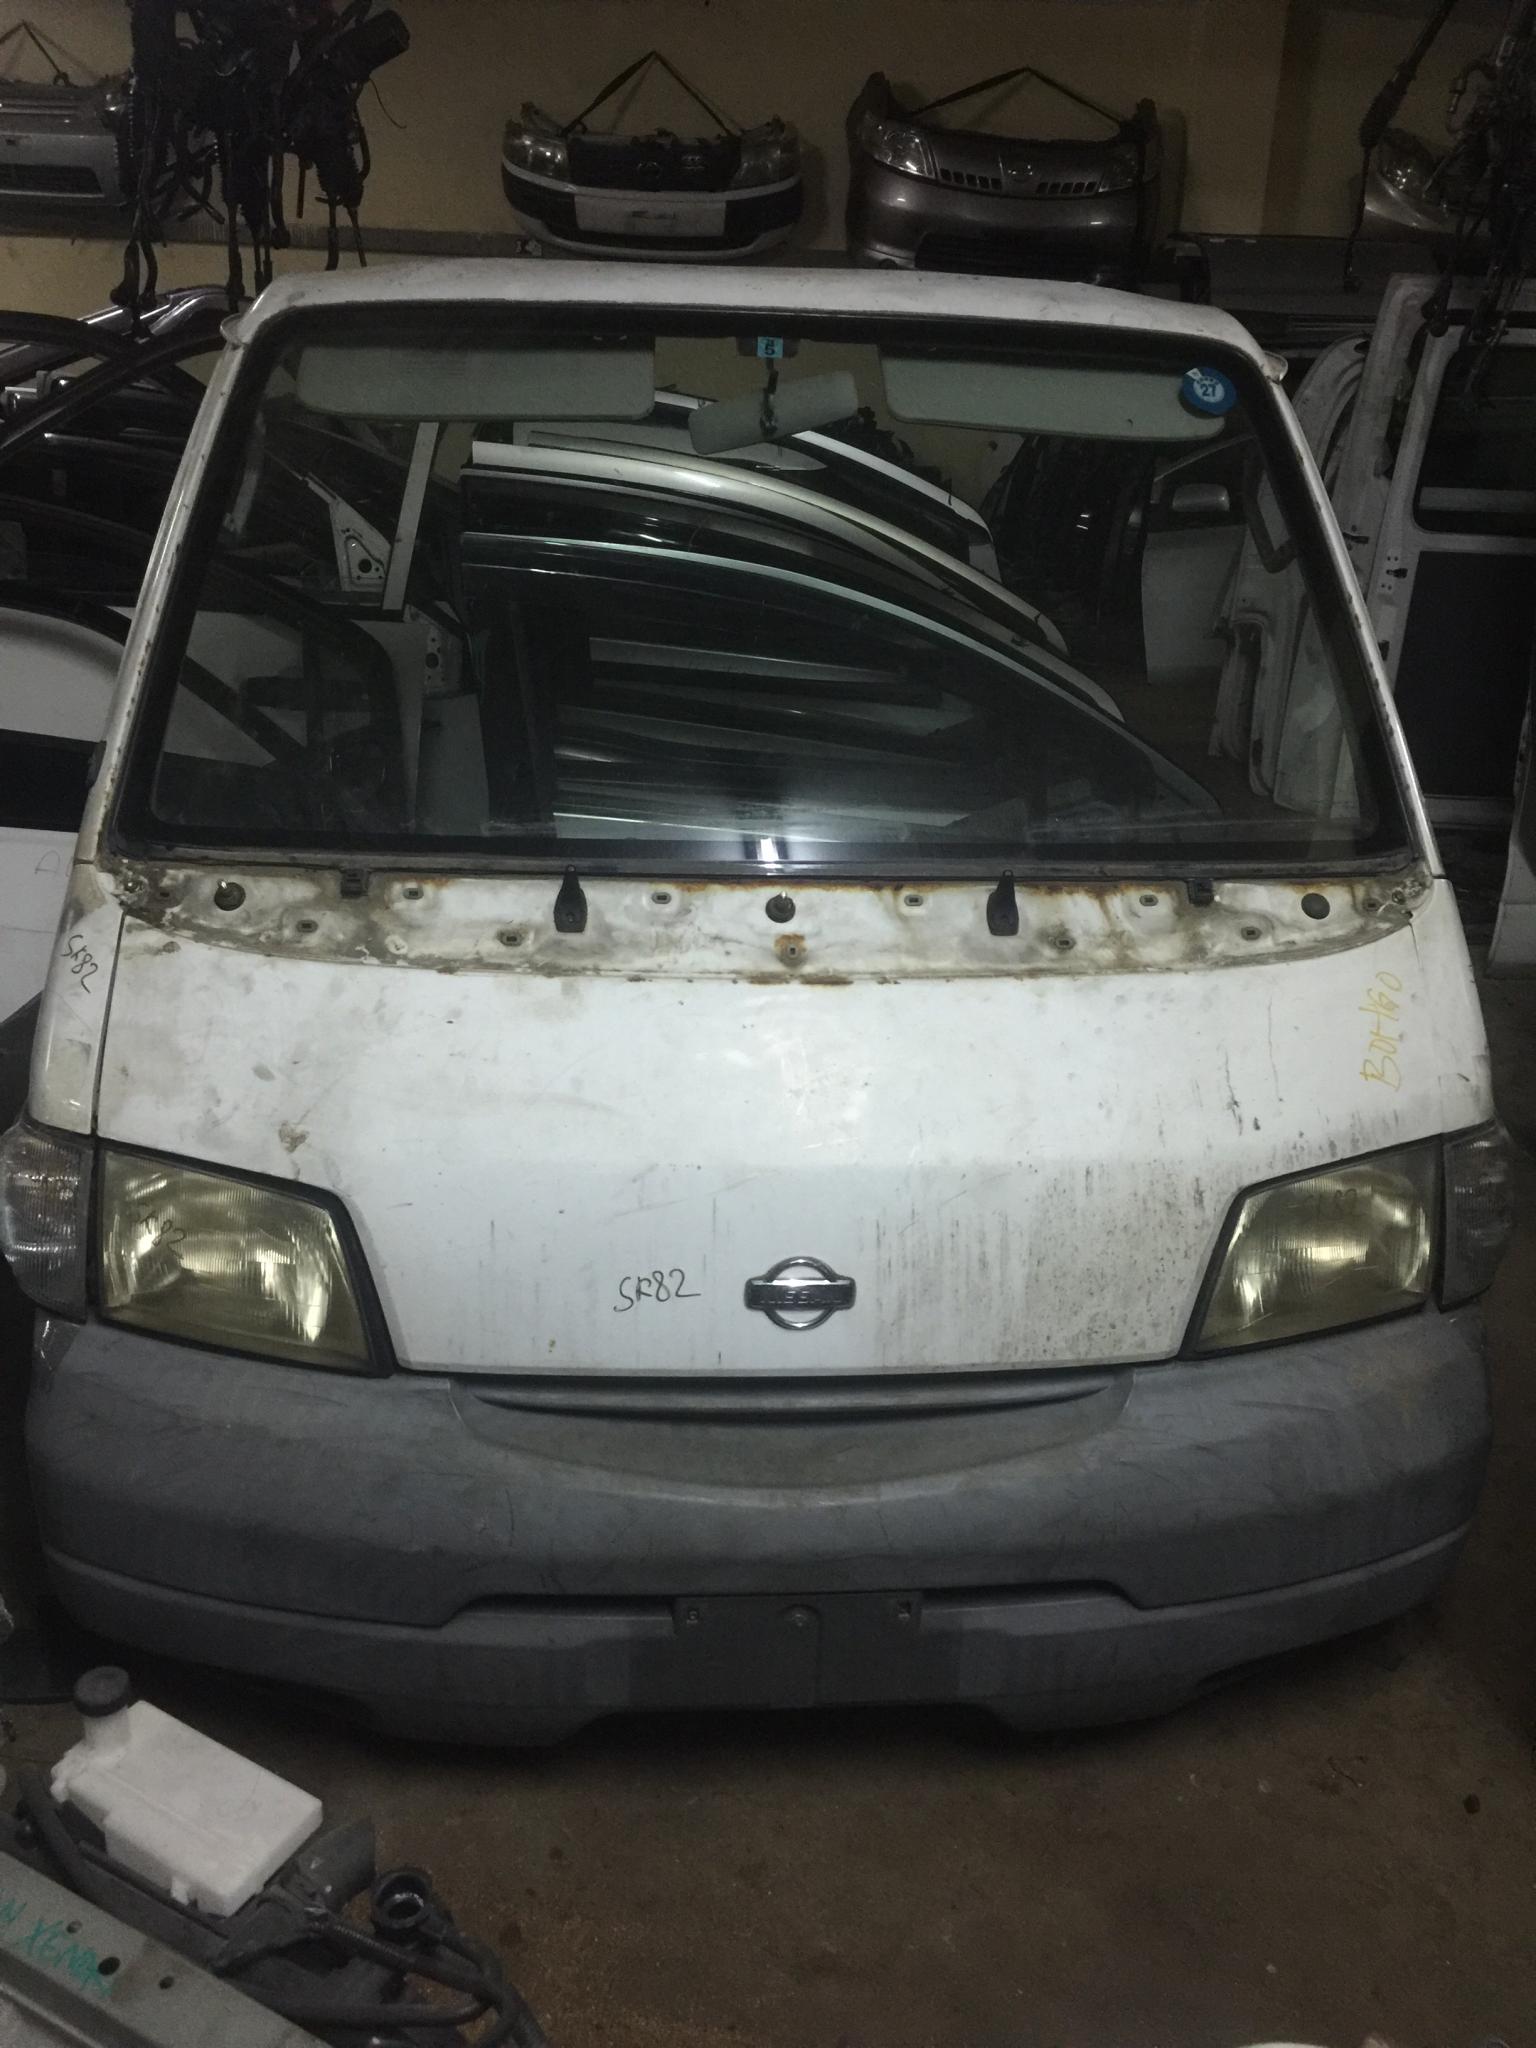 Nissan VENAT nose cut 00987